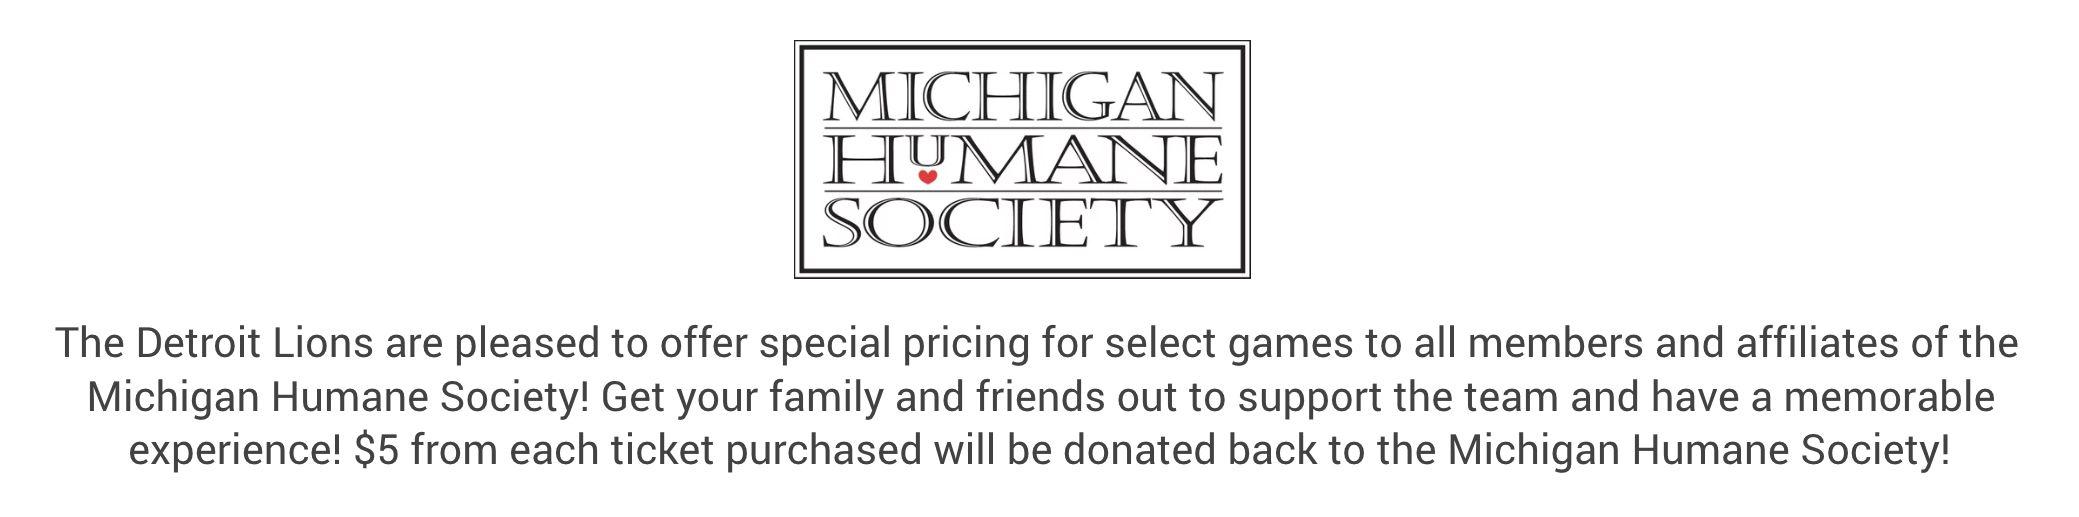 humane-society-header